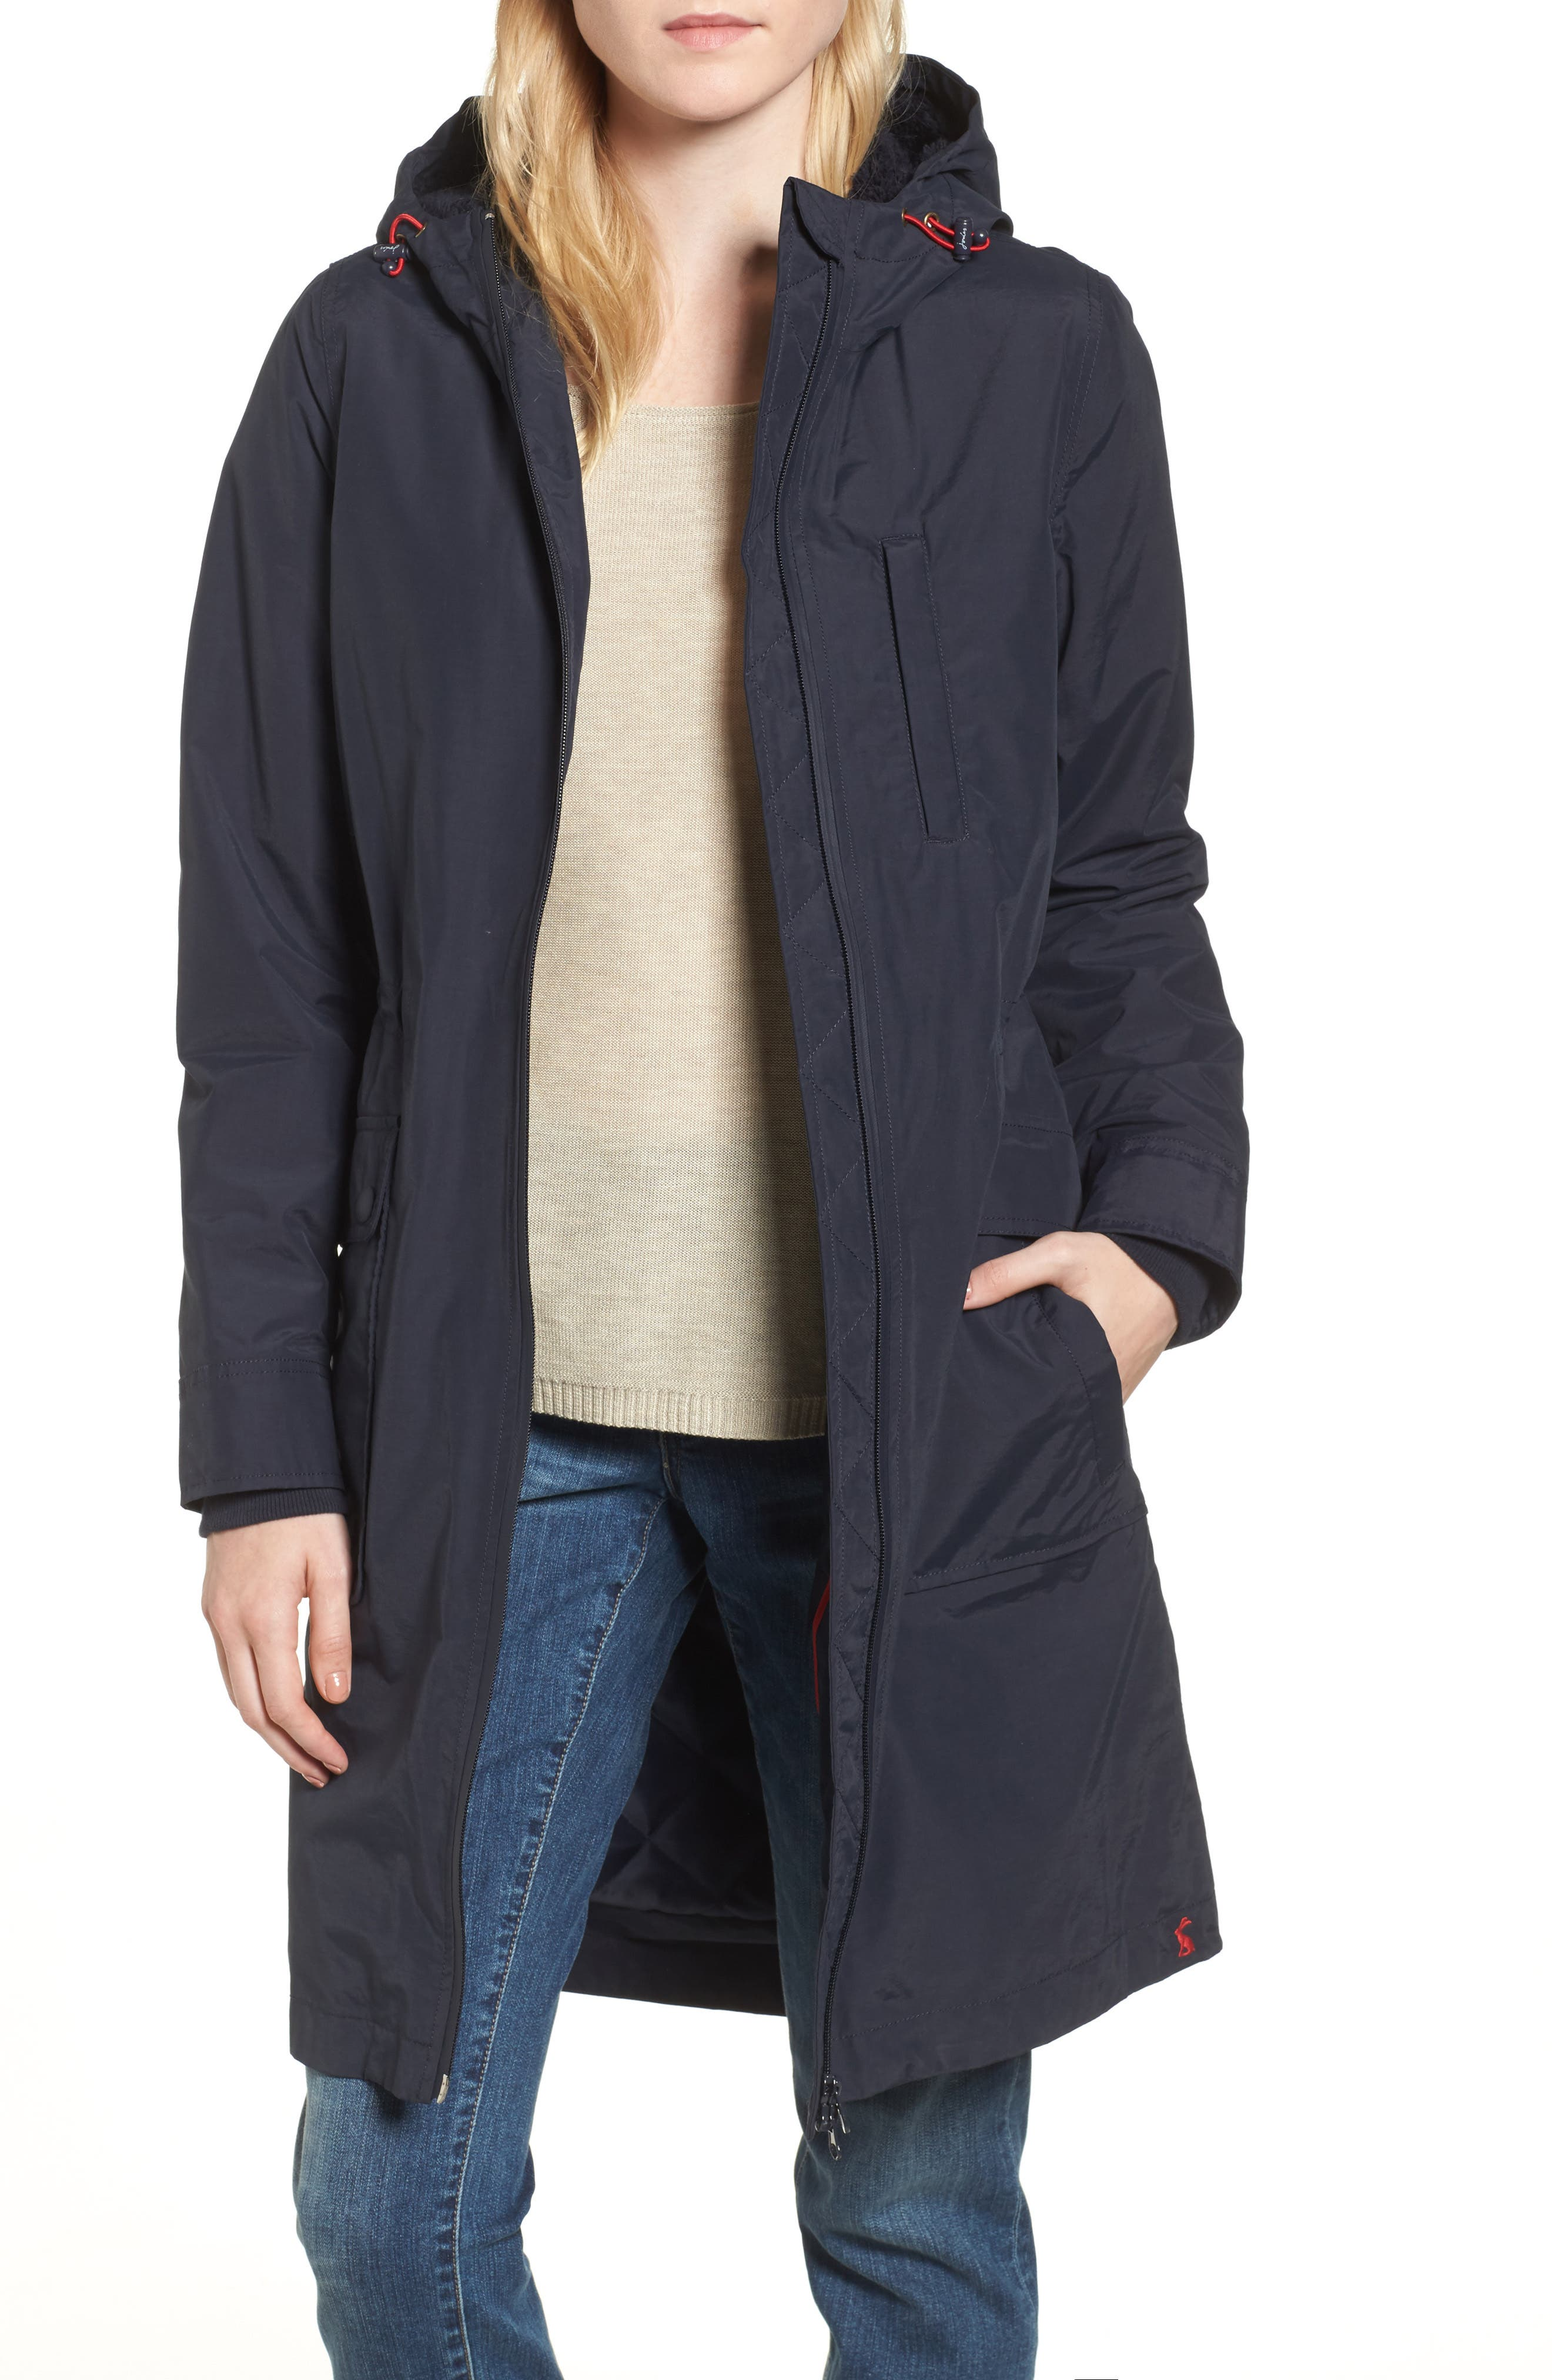 Hooded Fleece Lined Raincoat,                         Main,                         color, Marine Navy